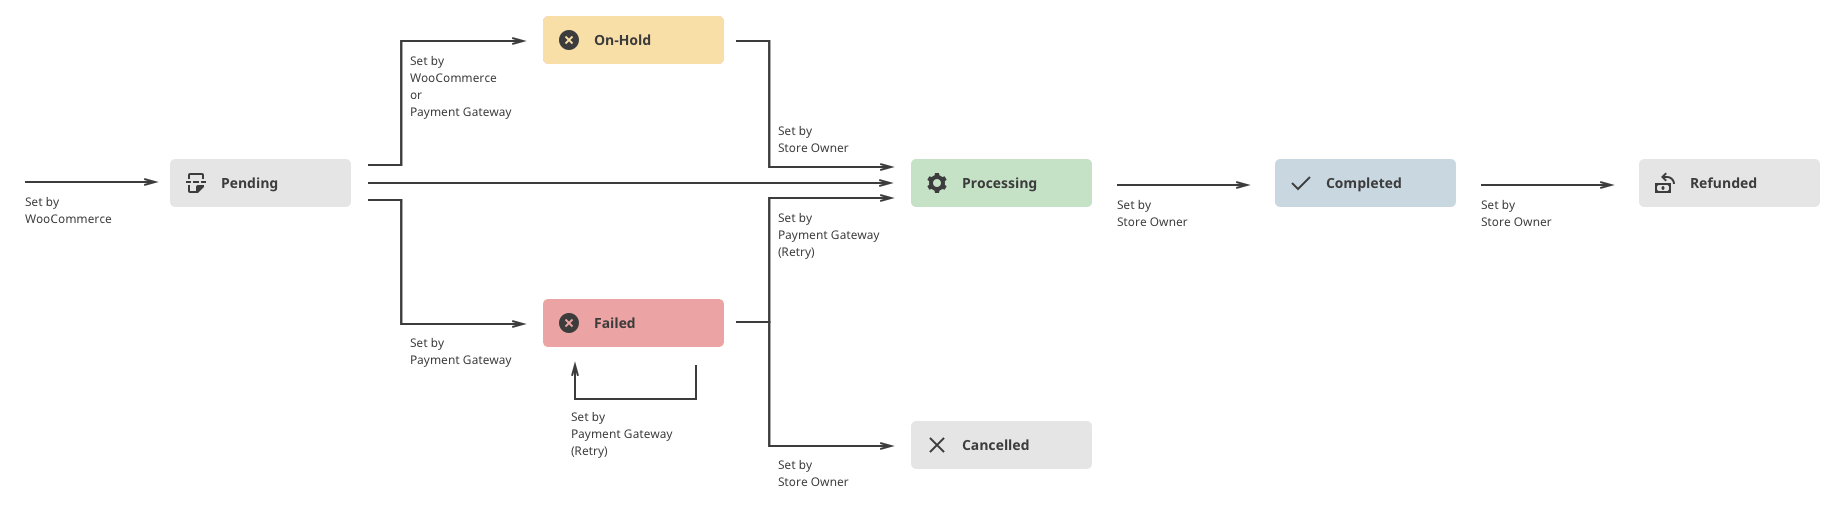 Woocommerce order process